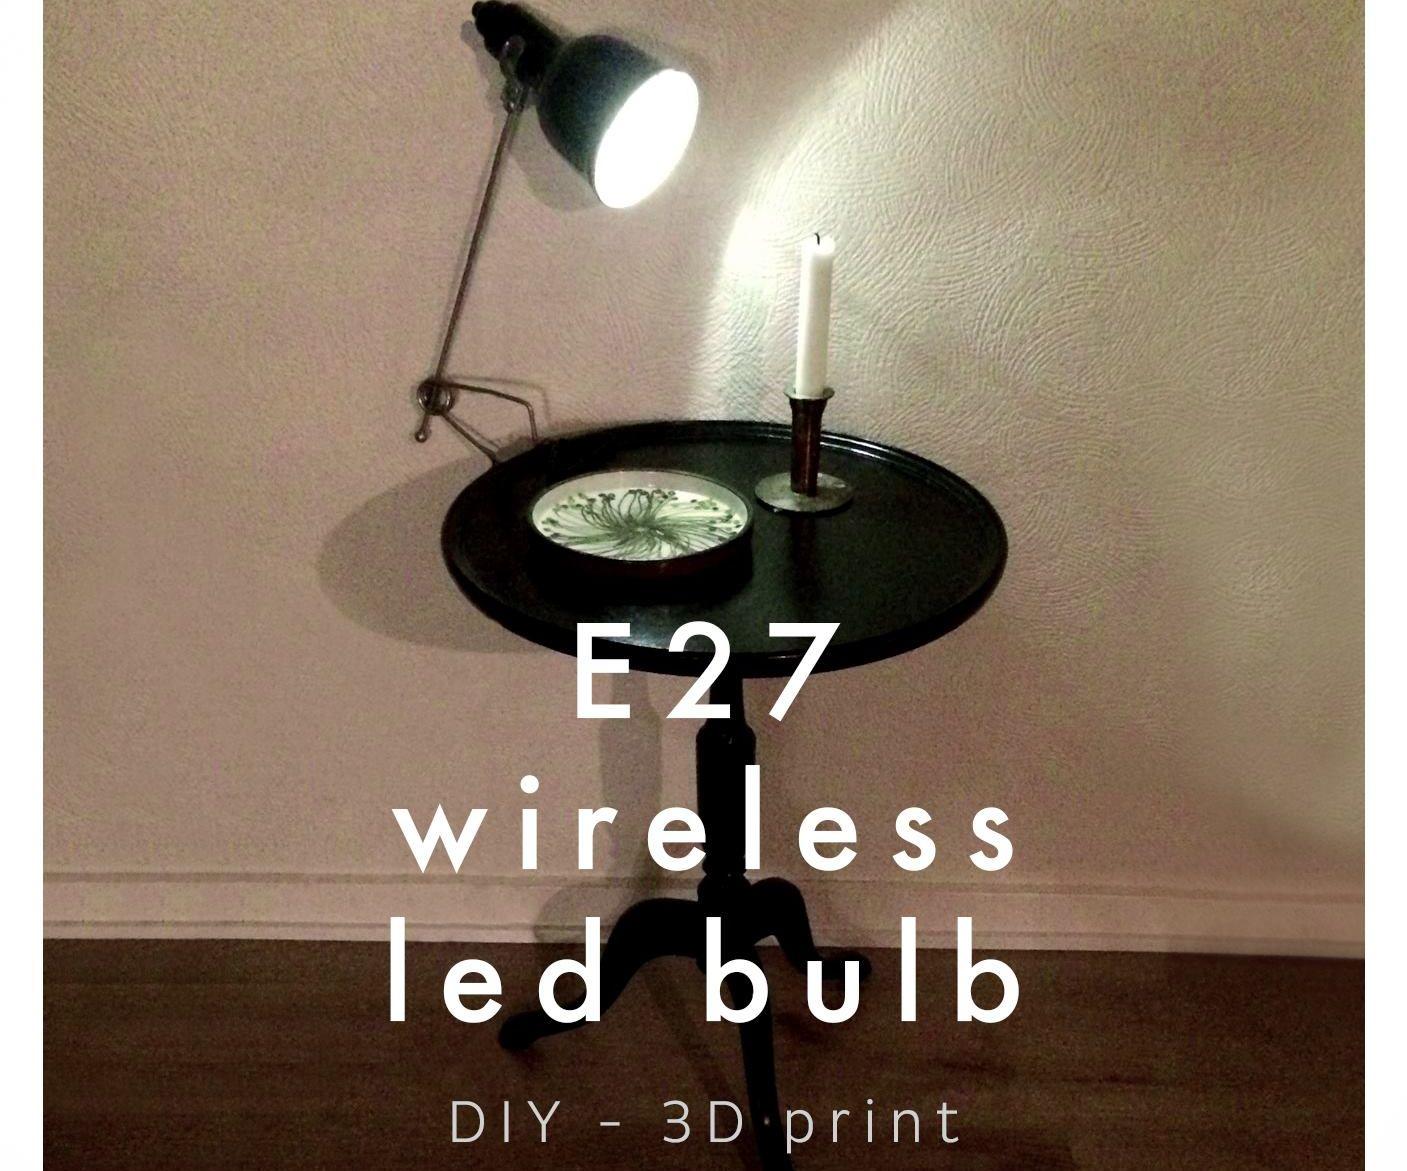 E27 Wireless LED Bulb